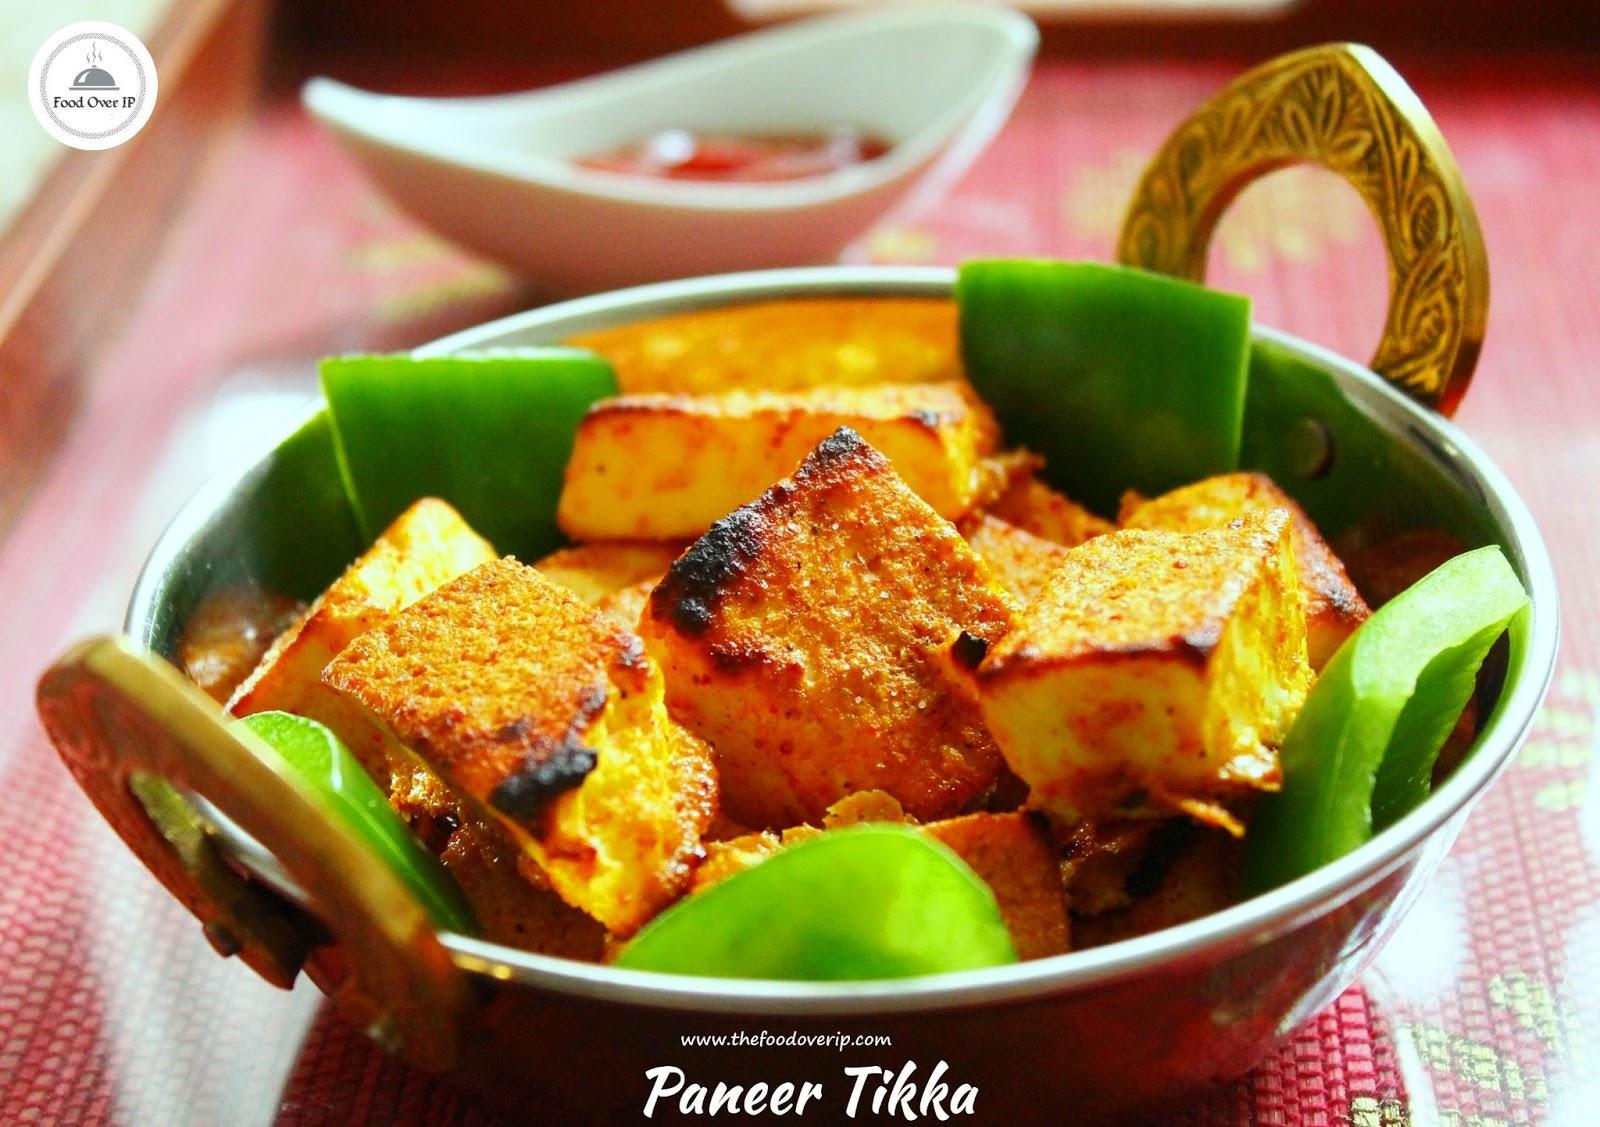 Food over IP: Paneer Tikka - Restaurant Style